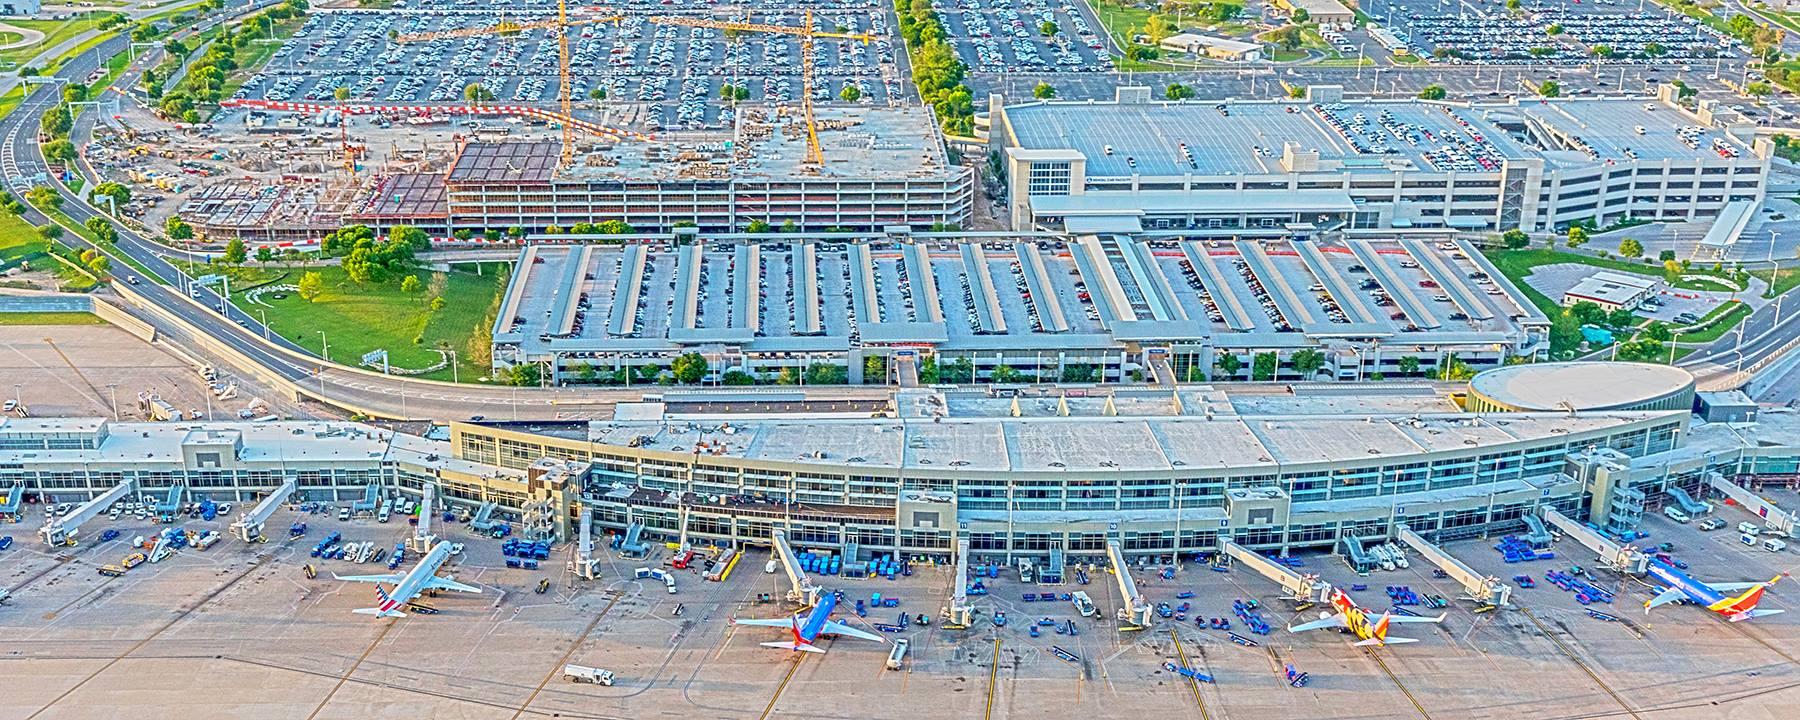 Overhead of airport plane docks, roof, parking